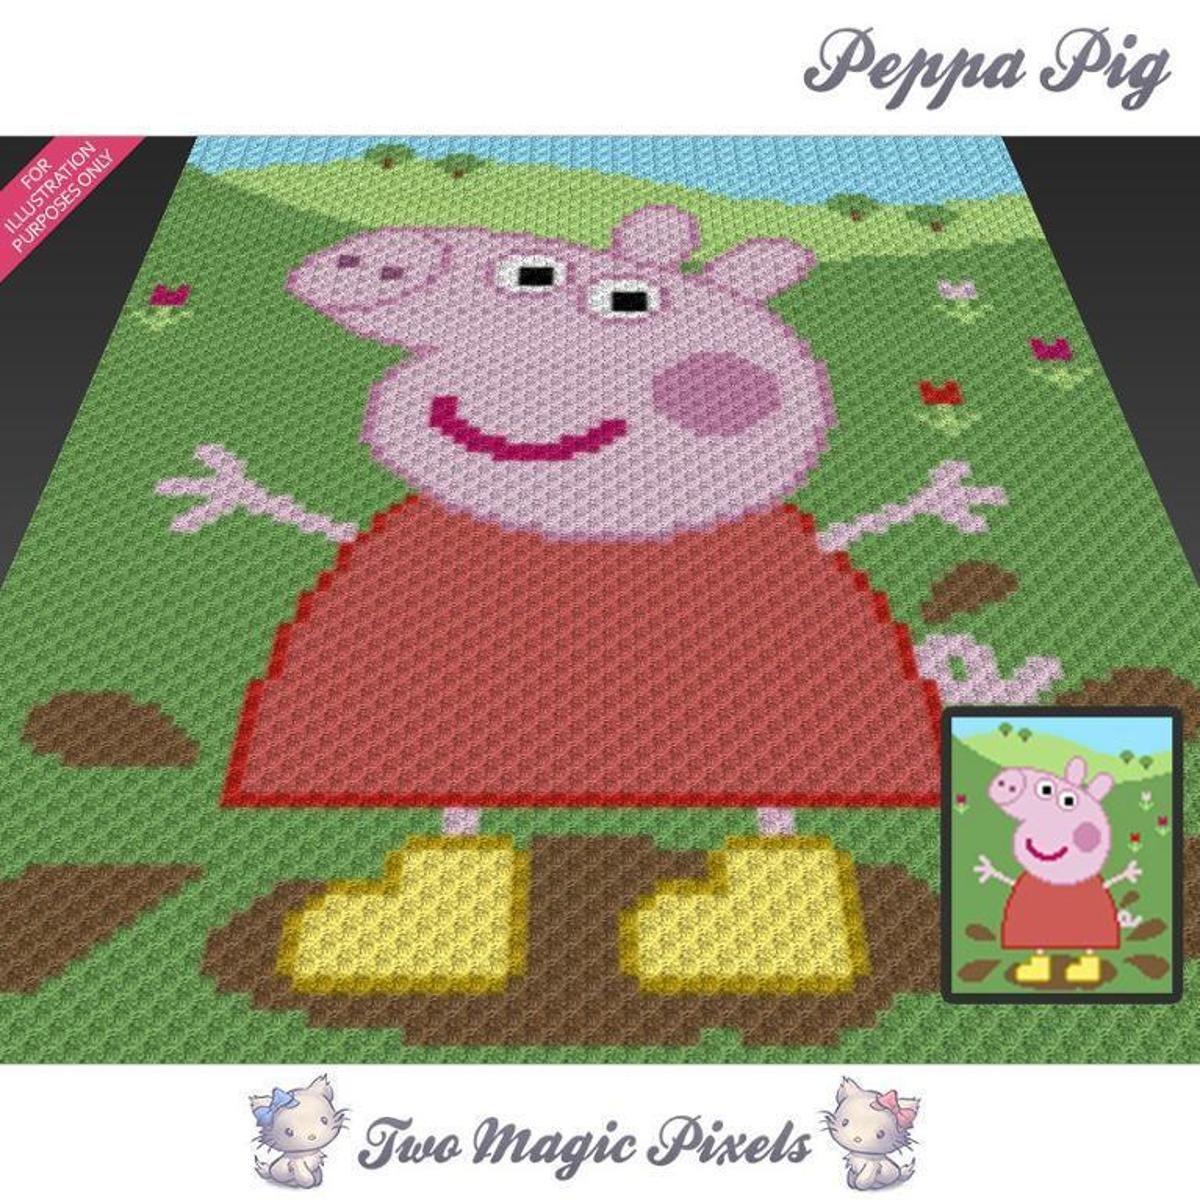 Peppa Pig inspired c2c crochet graph | Craftsy | graphghans | C2c